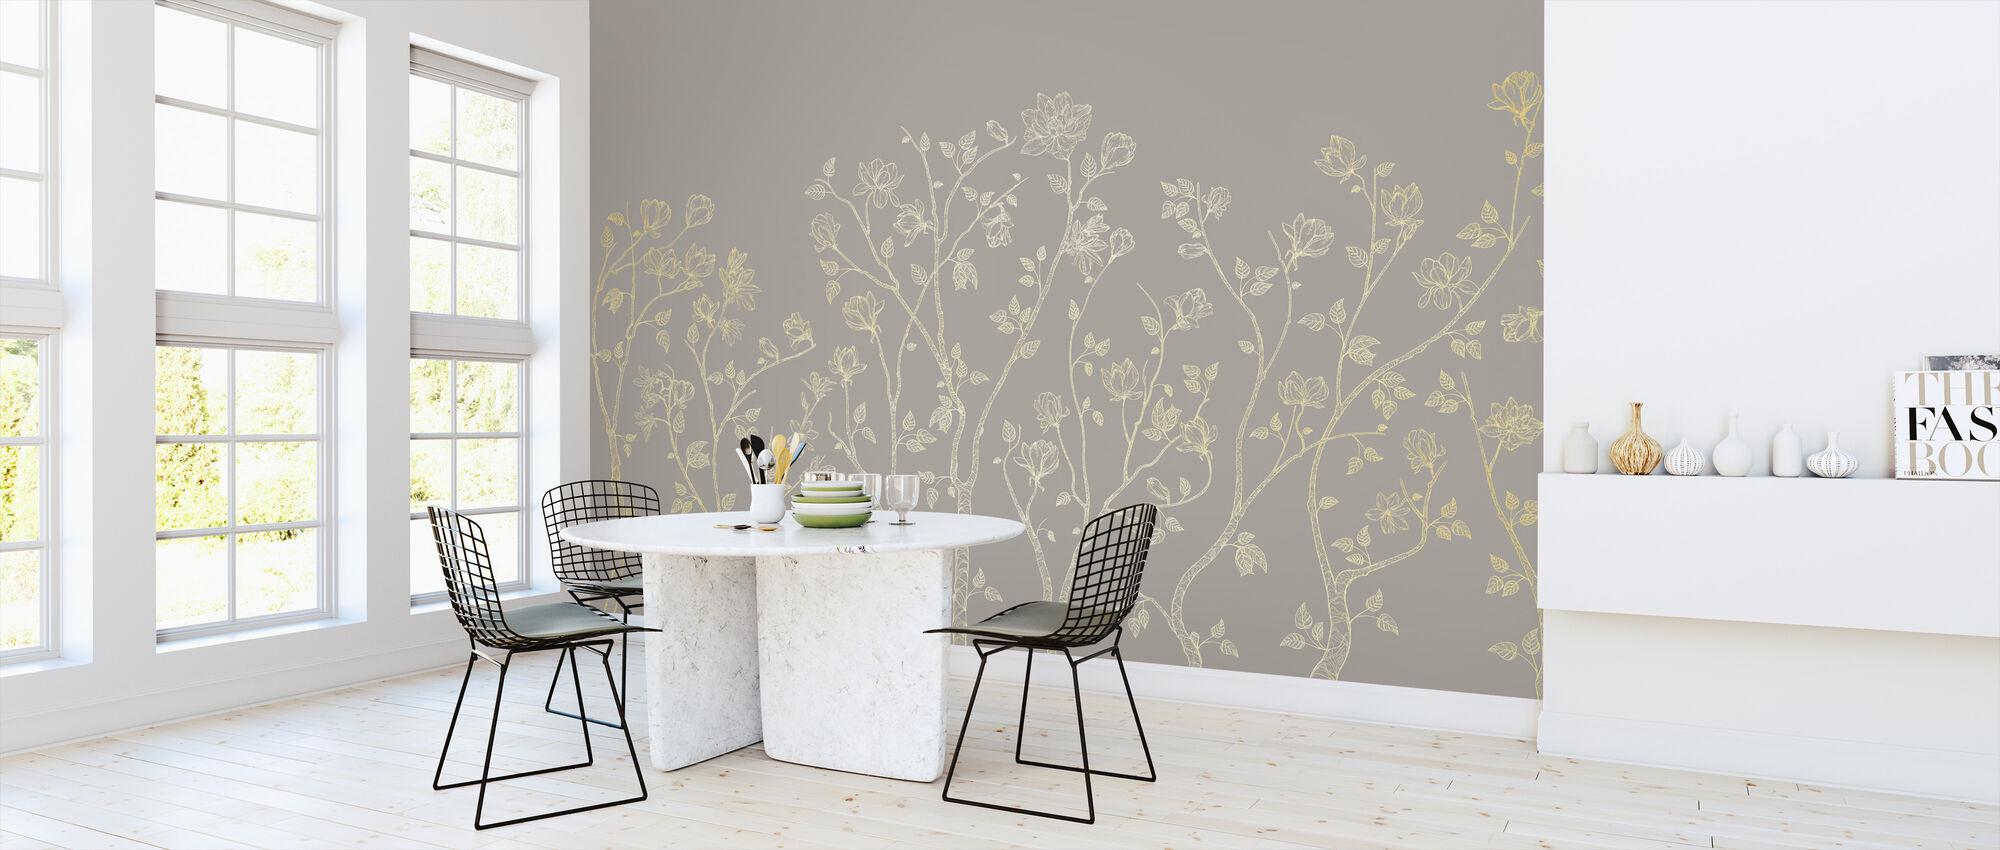 Crescent Vegetative - Beige - Wallpaper - Kitchen